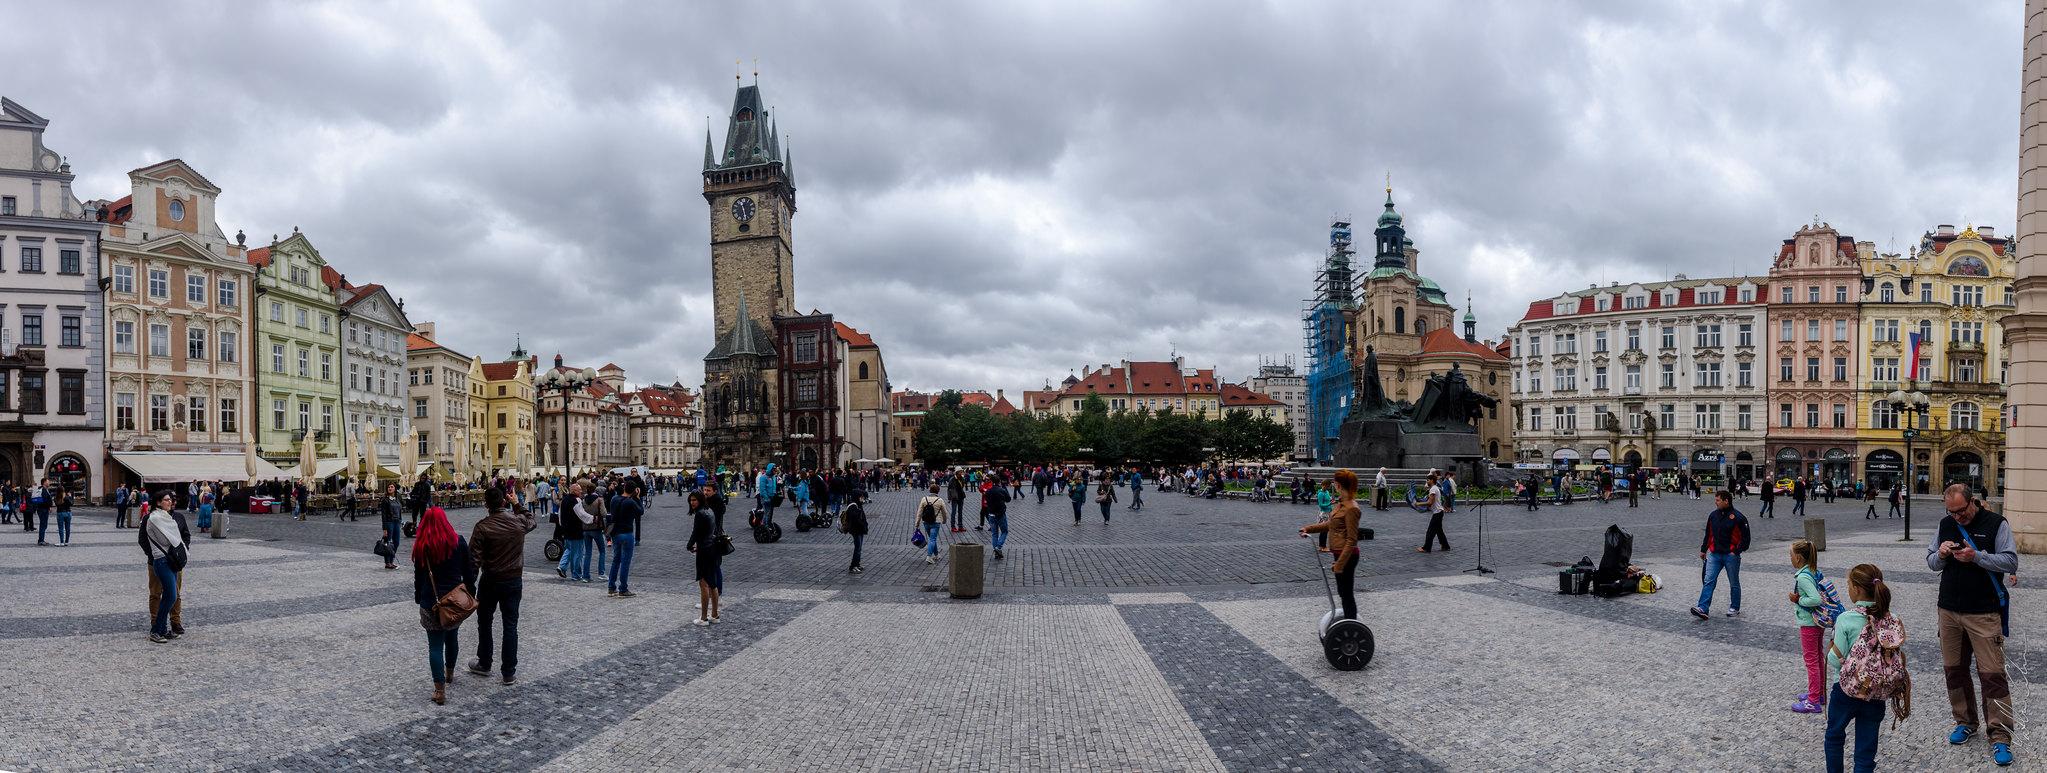 PragueVienneBudapest-Flickr-3